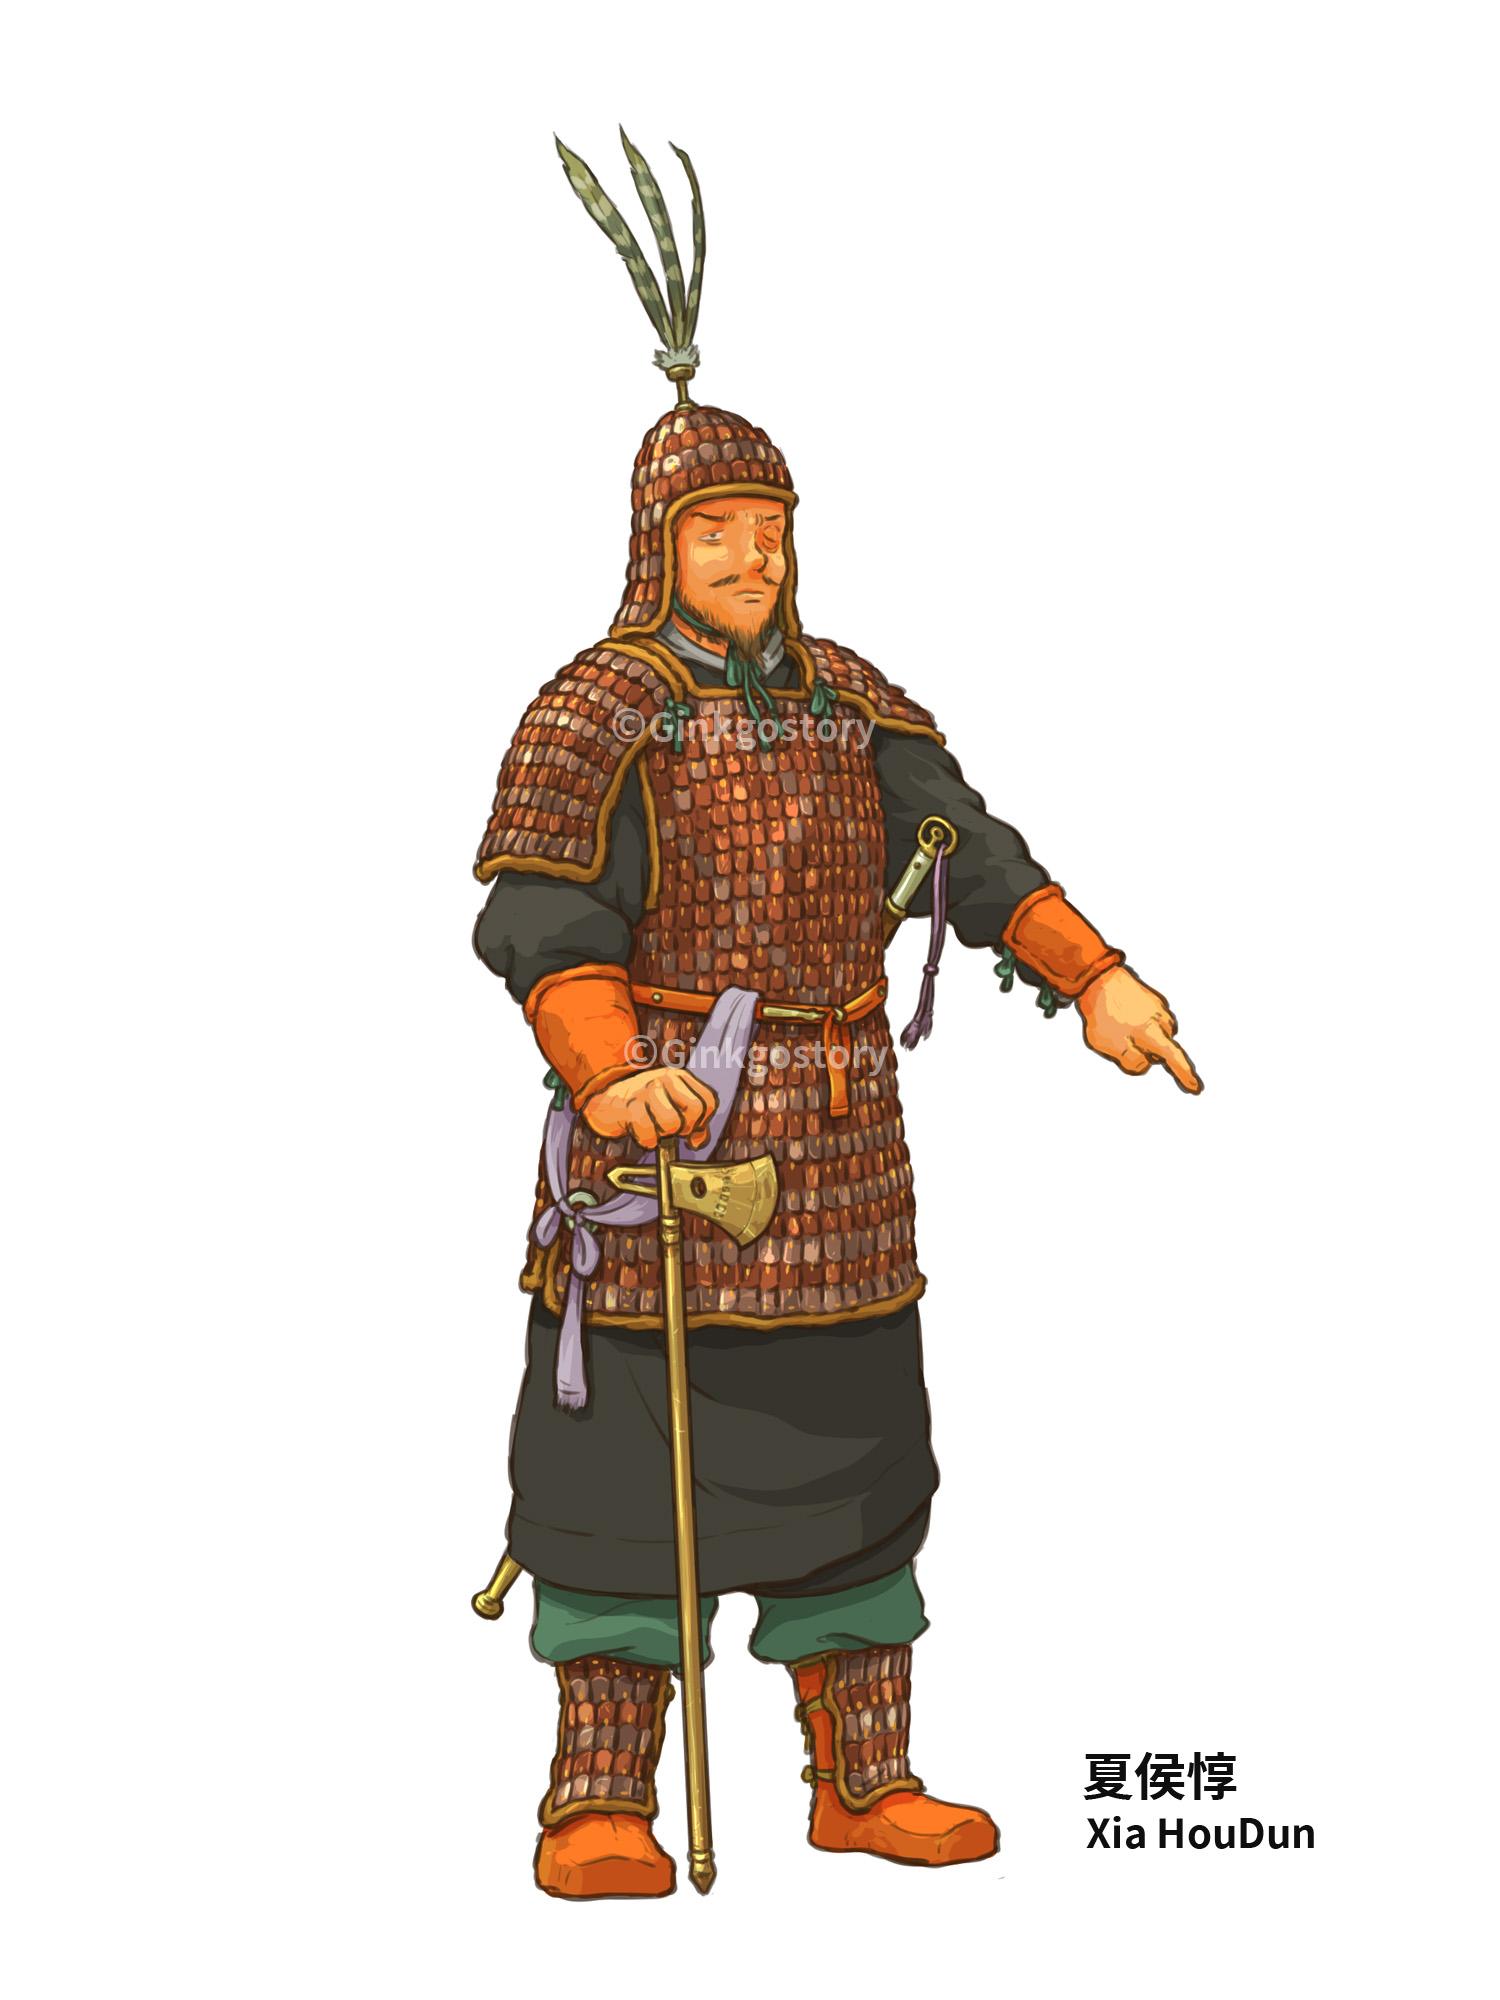 Three Kingdoms: Xia Hou Dun